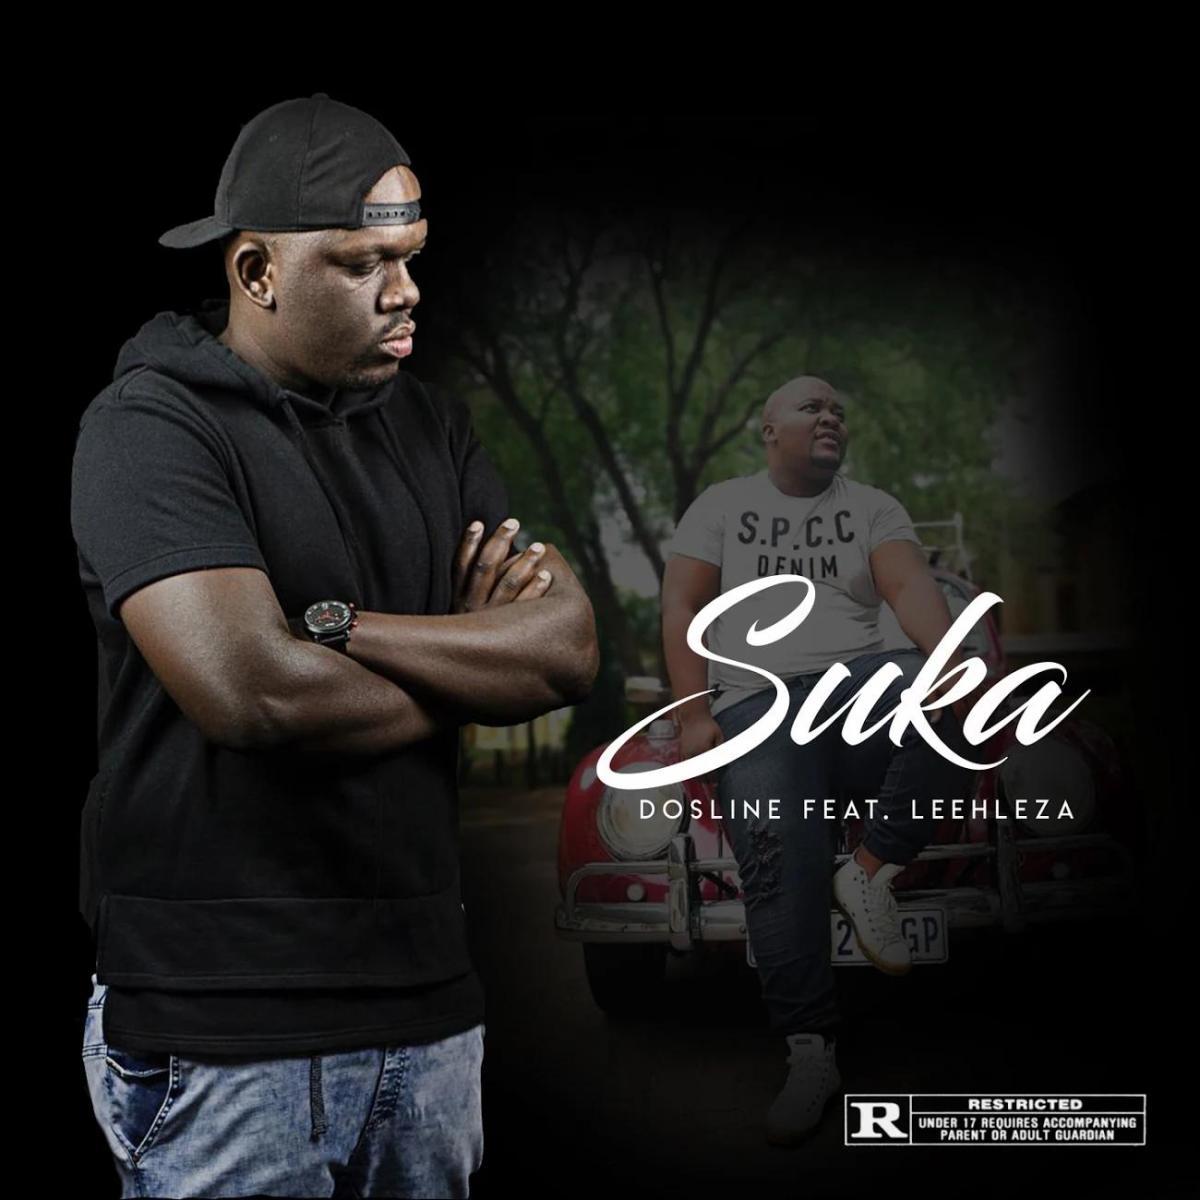 Dosline - Suka (feat. Leehleza)